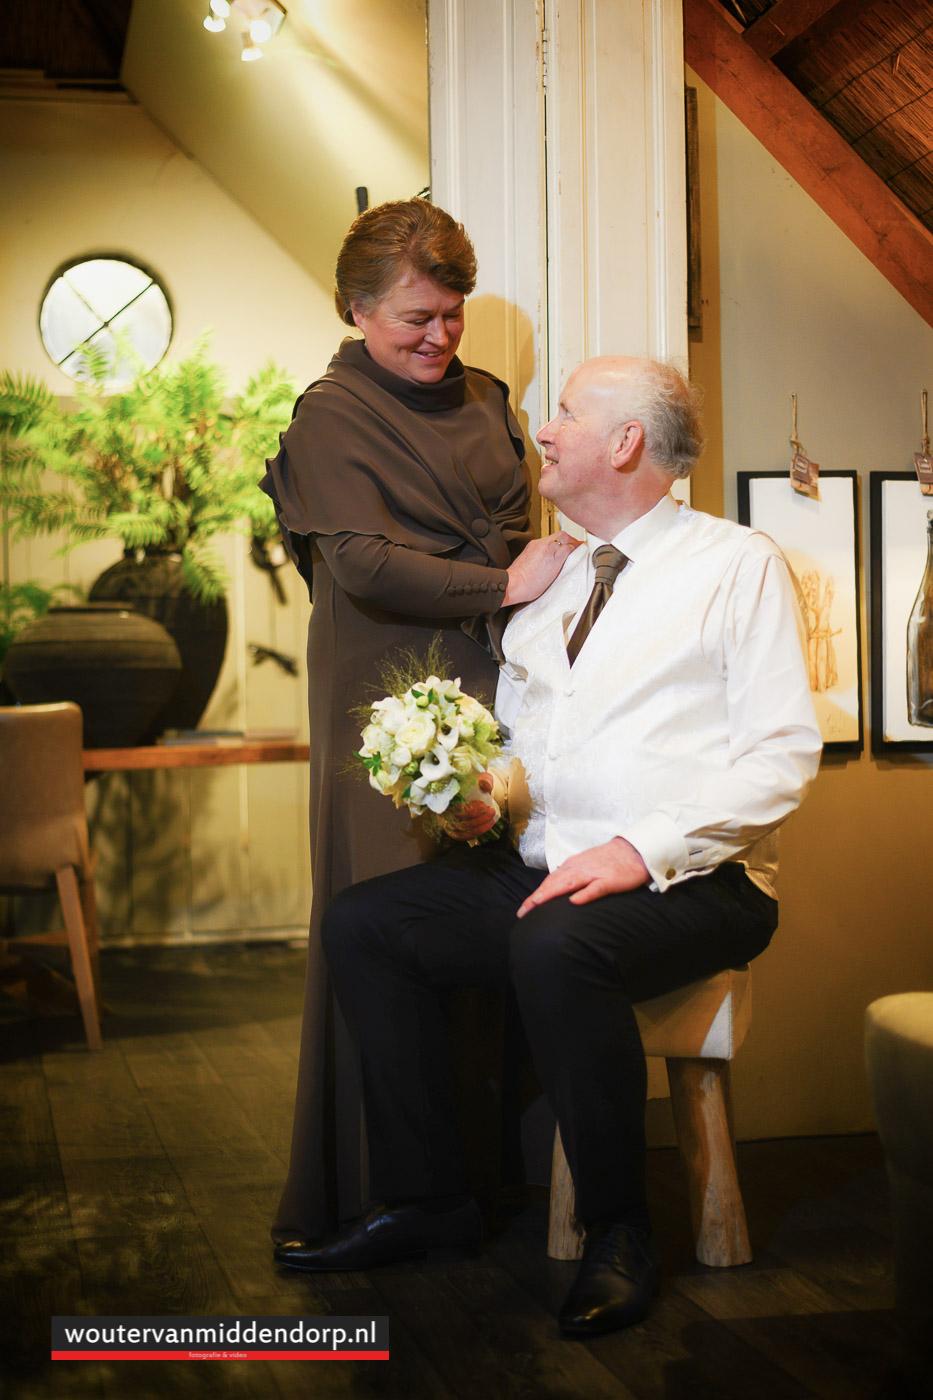 bruidsfotografie Wouter van Middendorp Uddel Elspeet Barneveld, omgeving trouwfotograaf-15